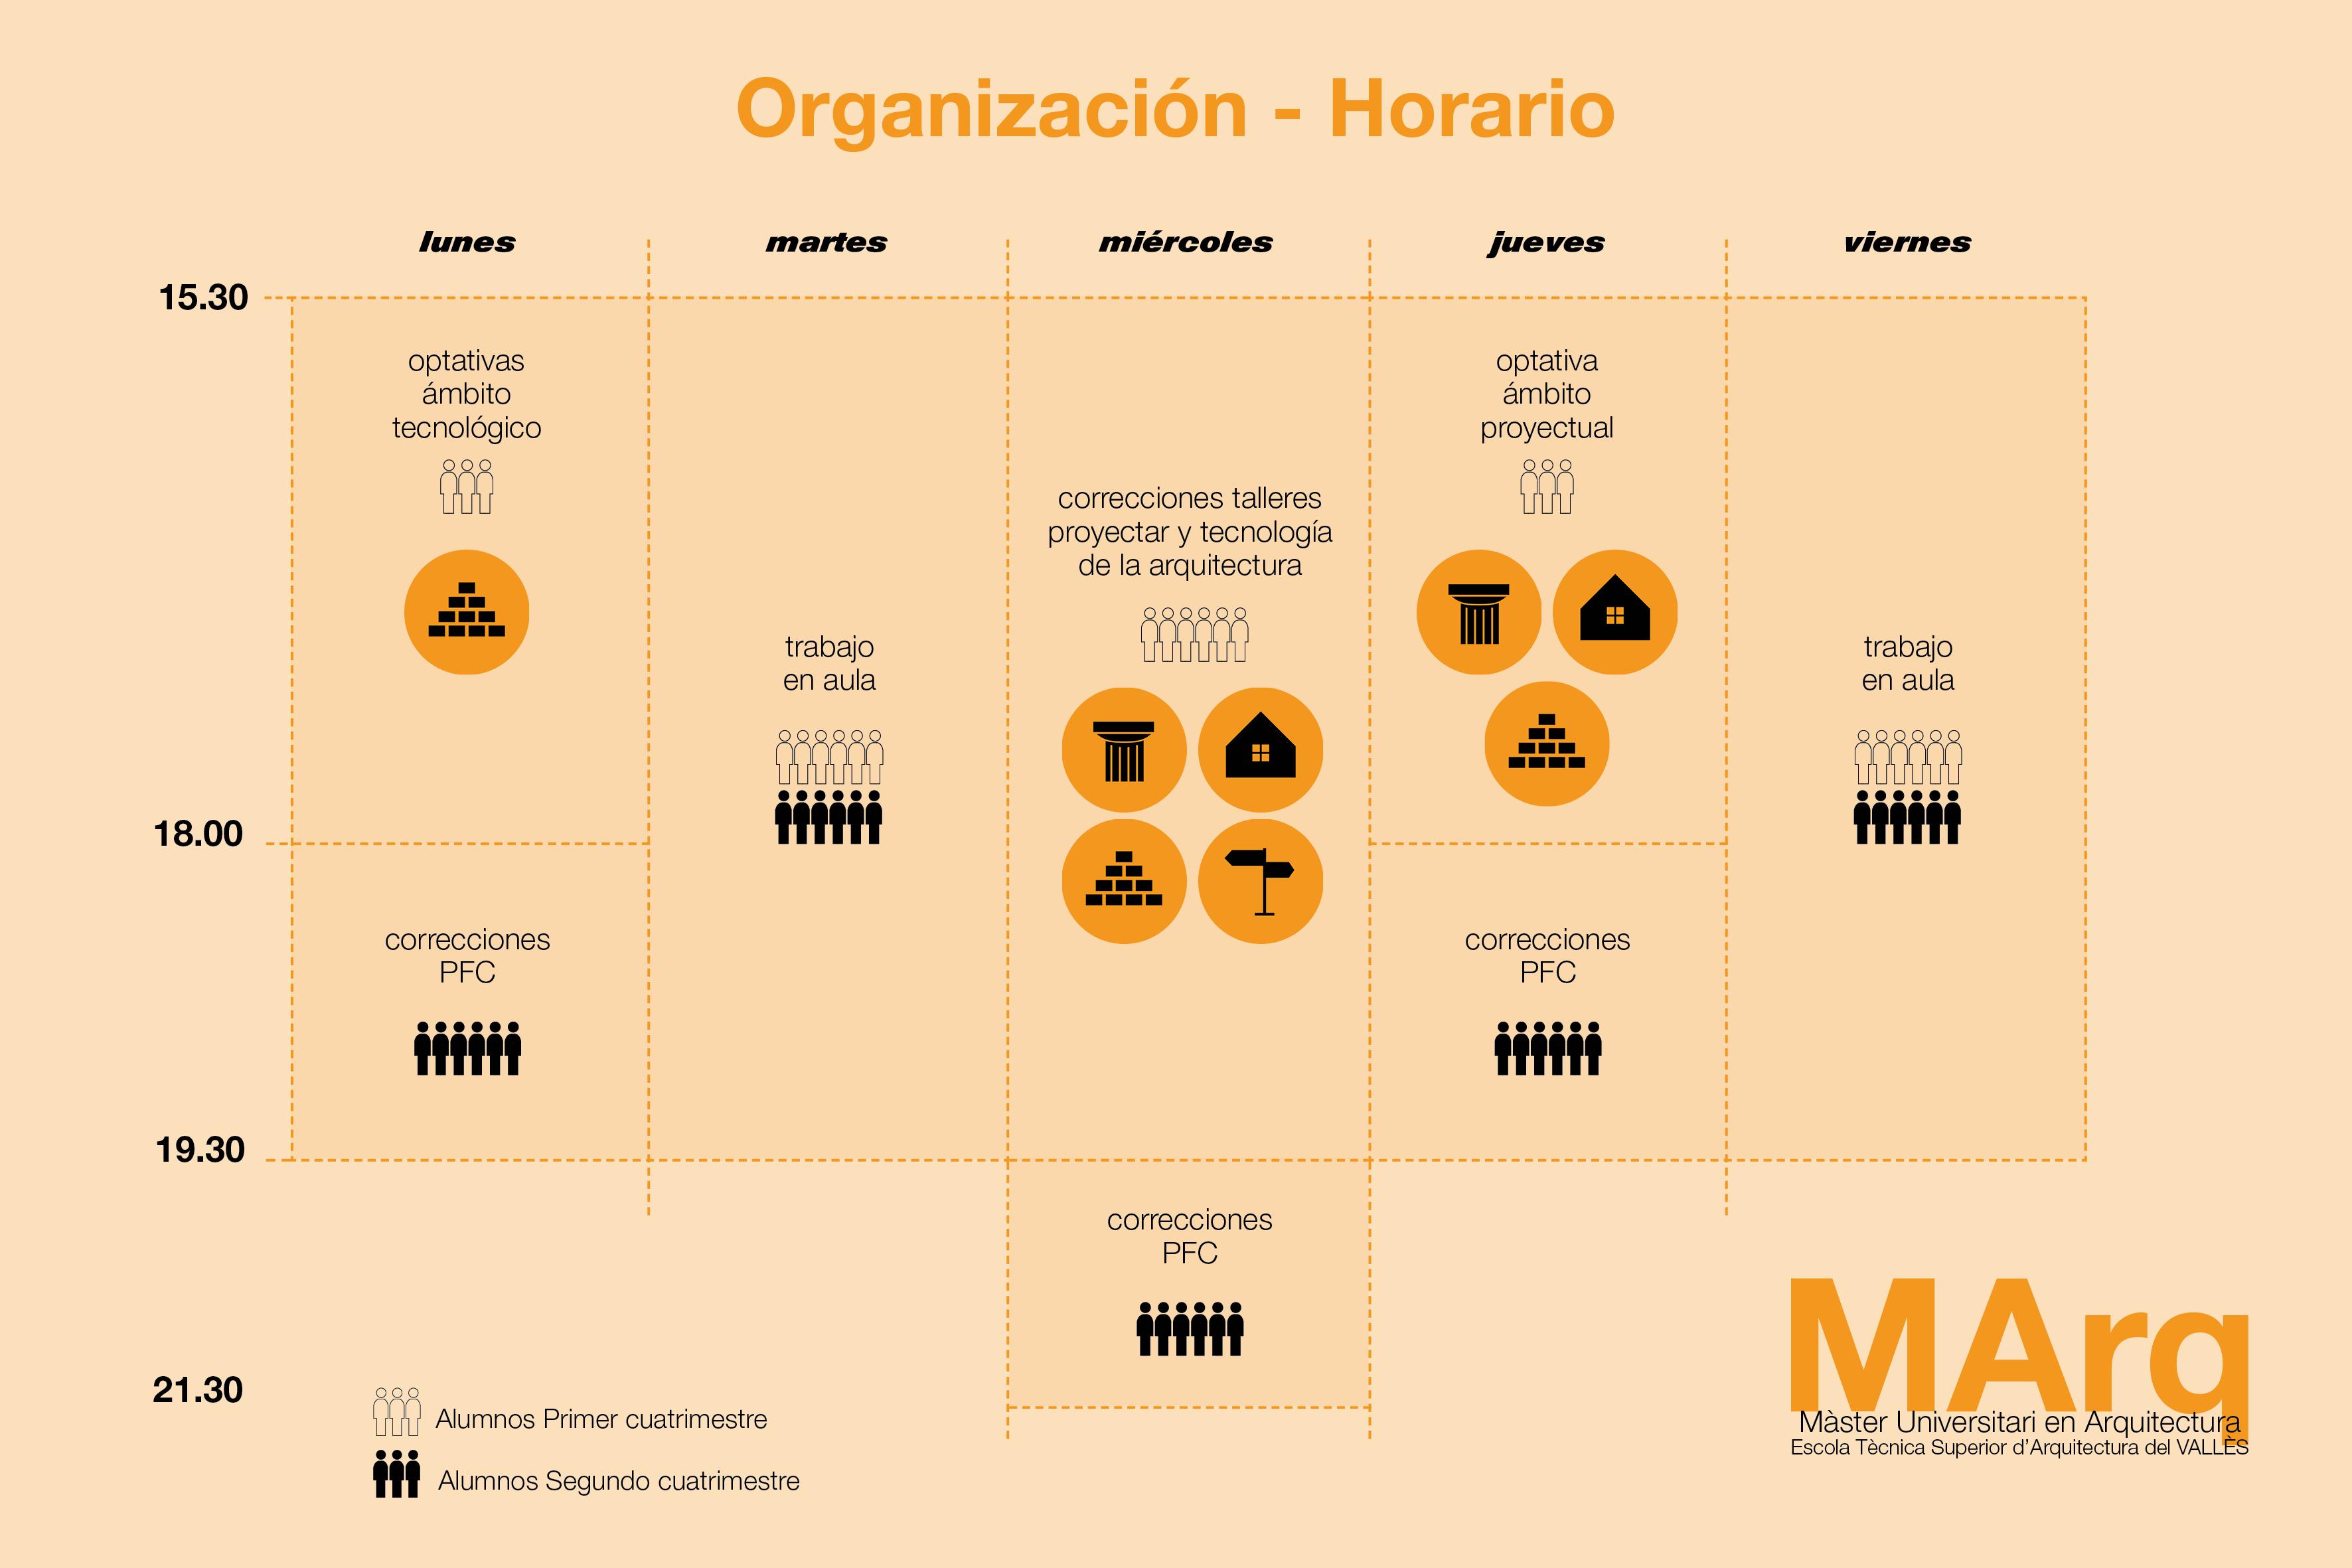 horaris marq castellano.jpg